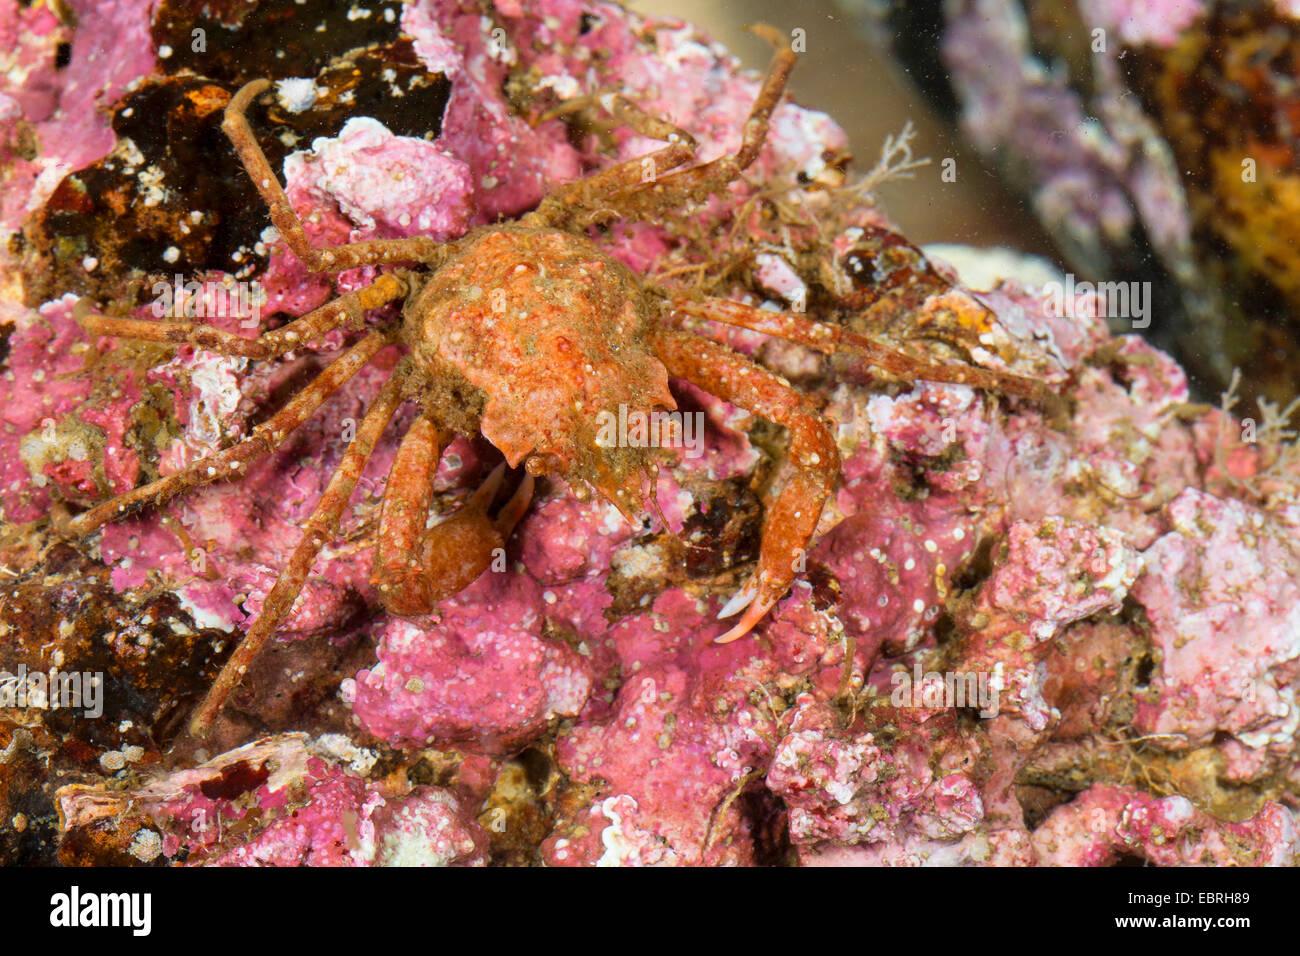 Contracted crab, Arctic lyre crab, Toad crab, Spider crab (Hyas coarctatus, Hyas serratus), top view - Stock Image